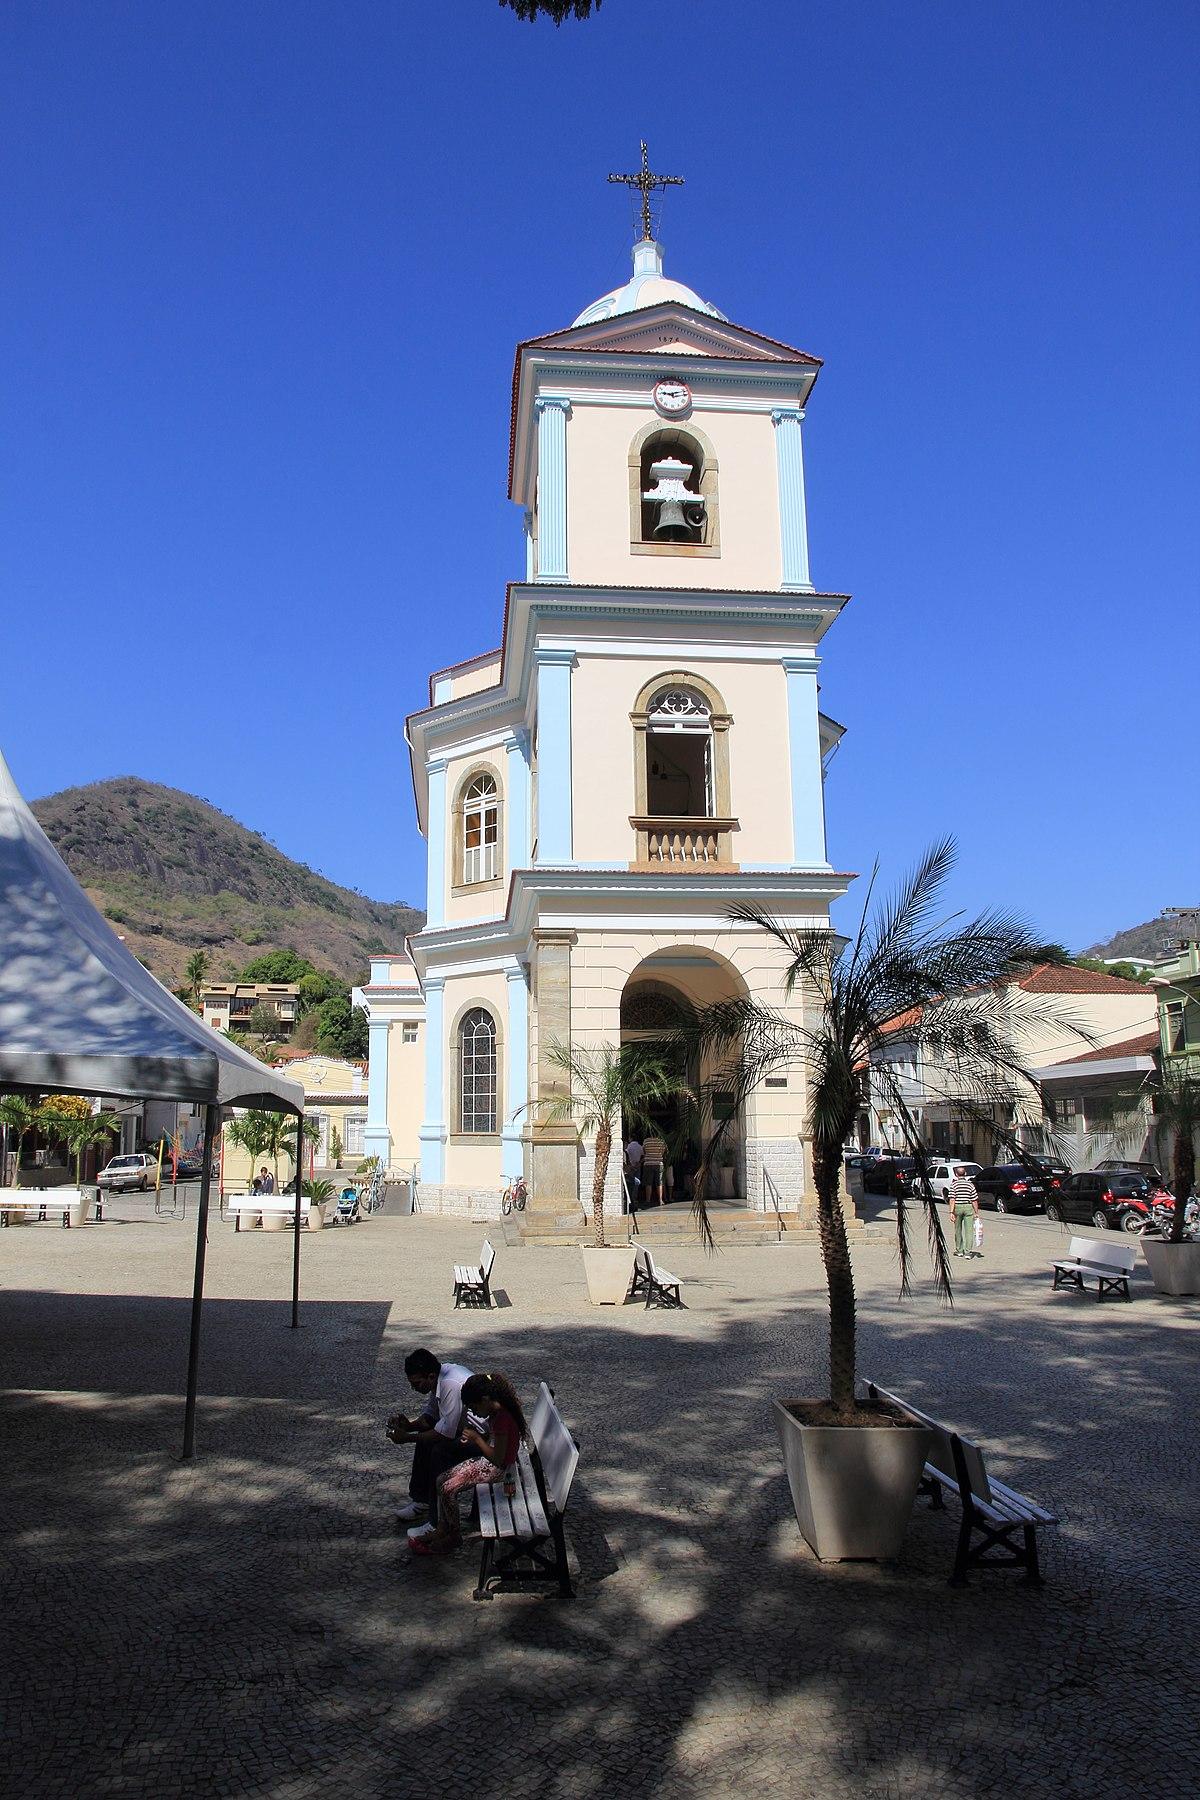 Cantagalo Rio de Janeiro fonte: upload.wikimedia.org